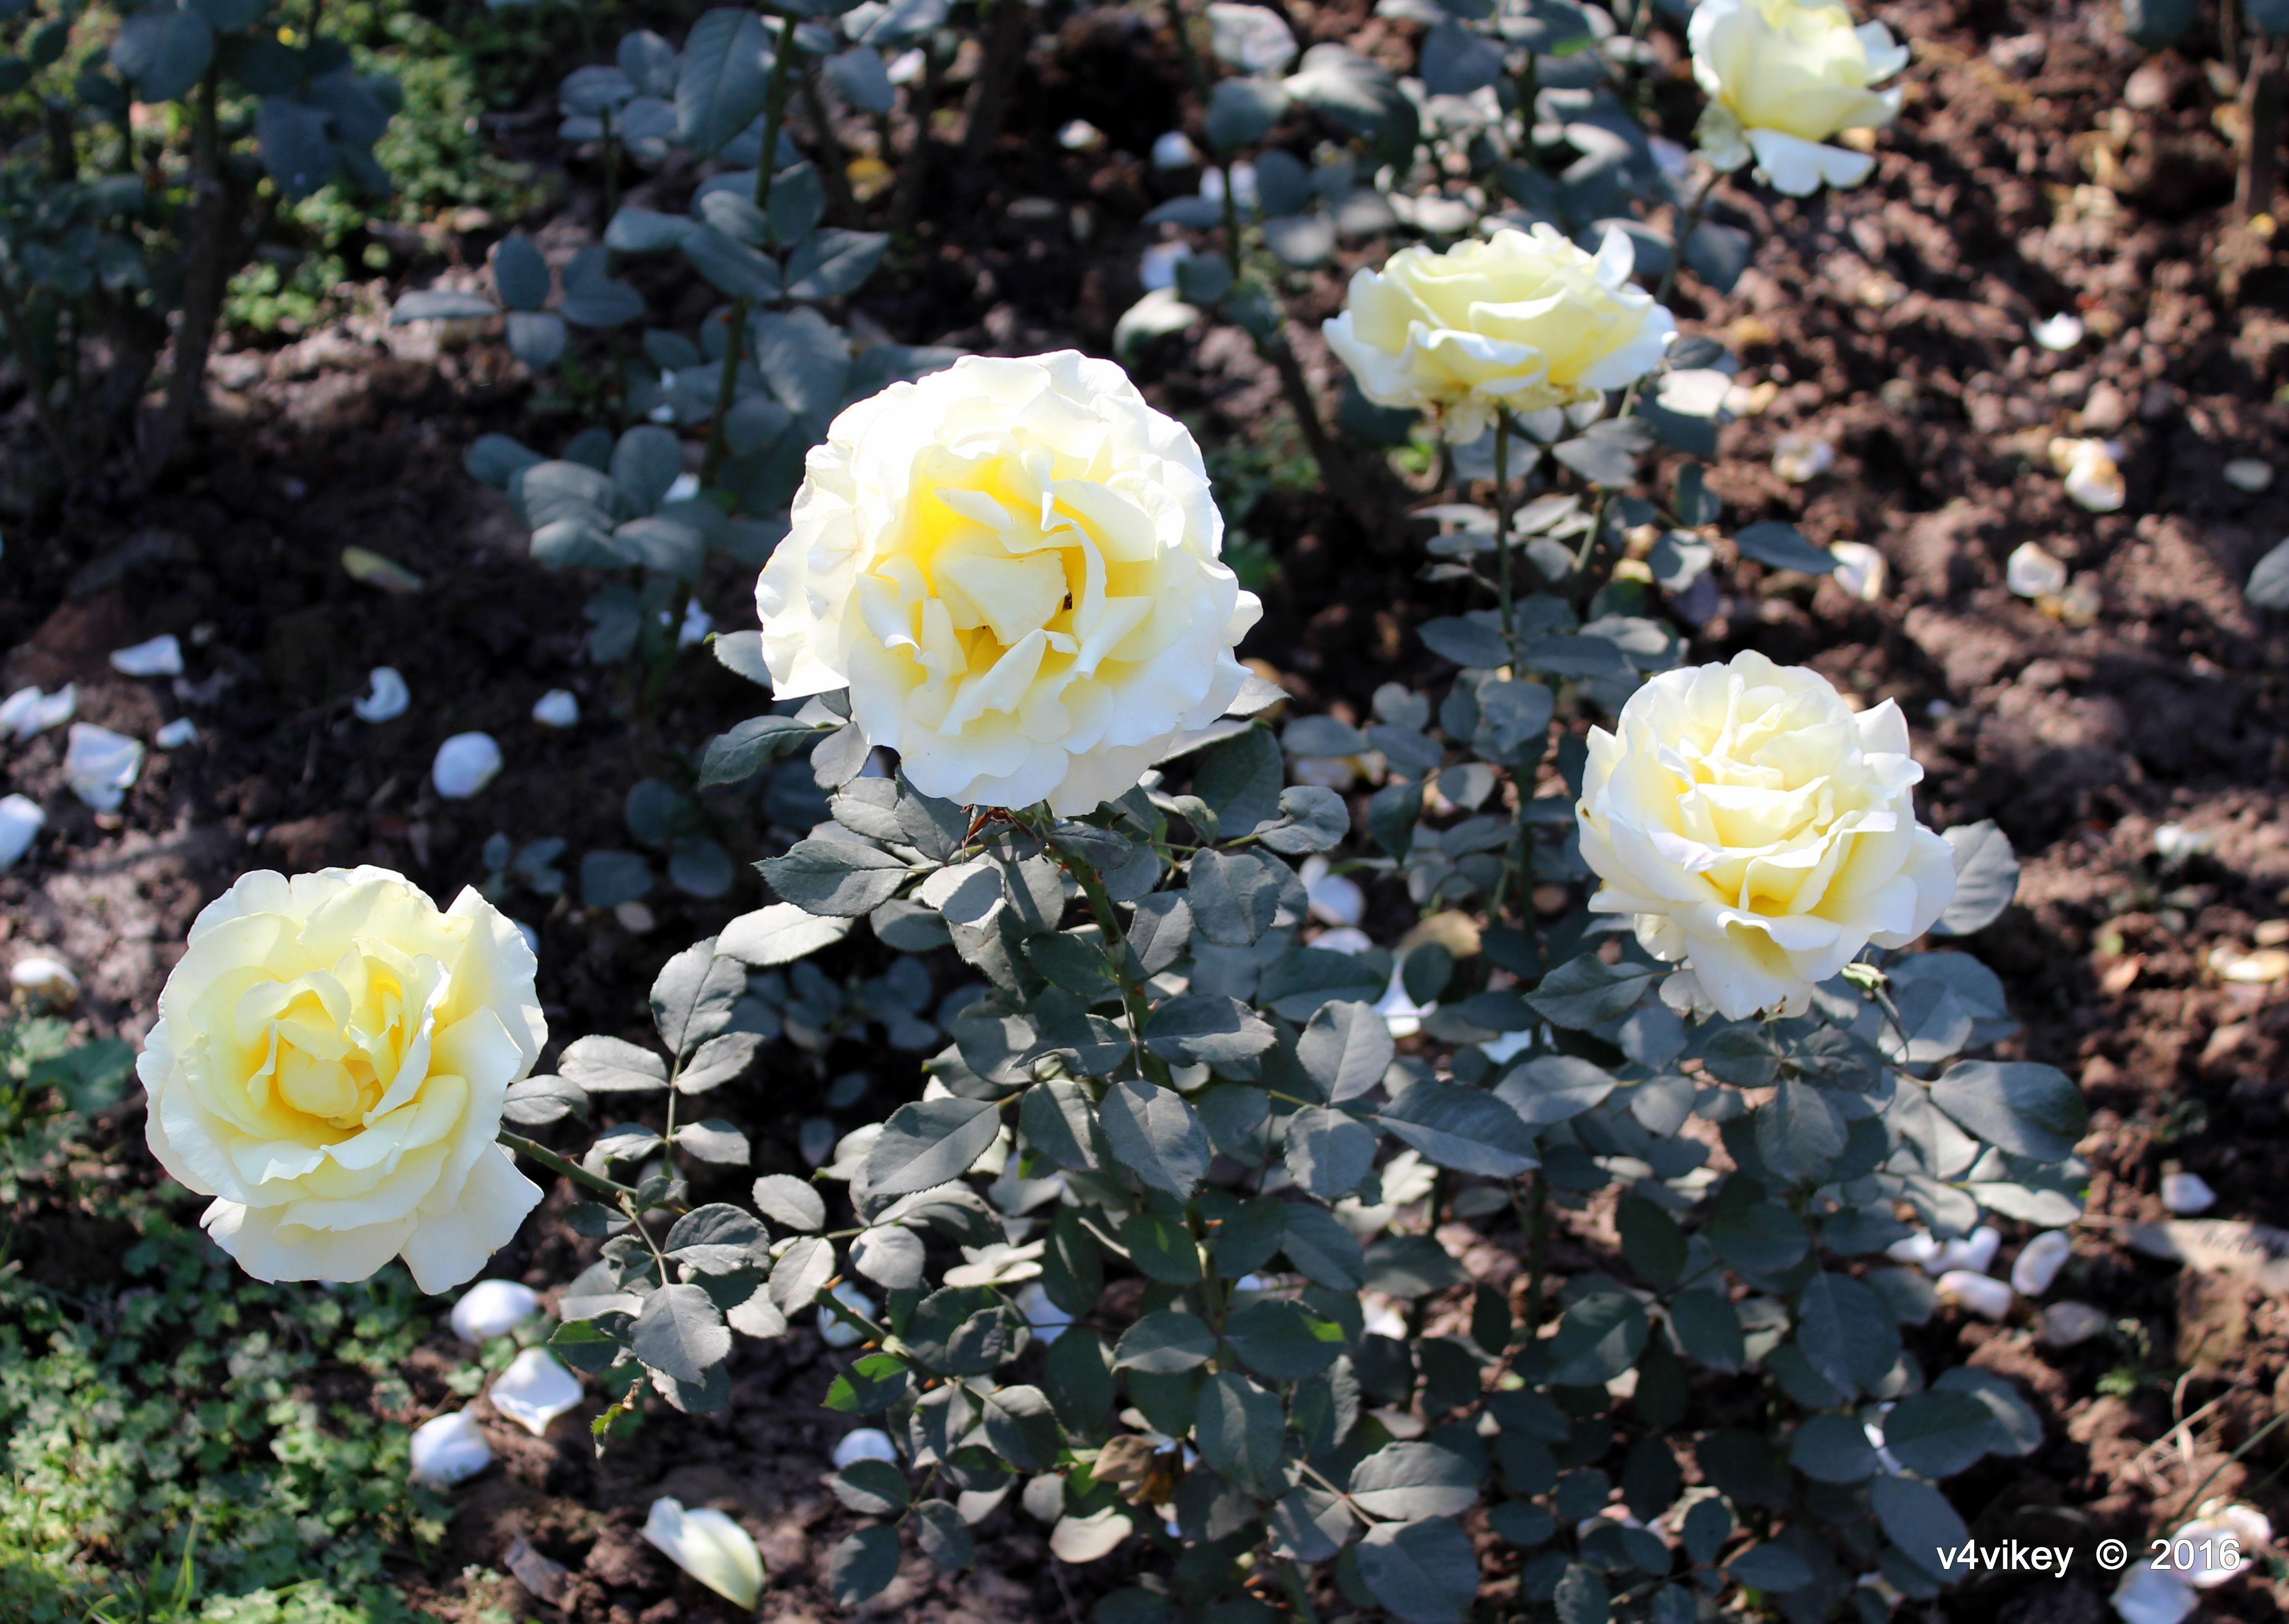 Yellow cream color rose flowers photograph wallpaper tadka for Cream rose wallpaper